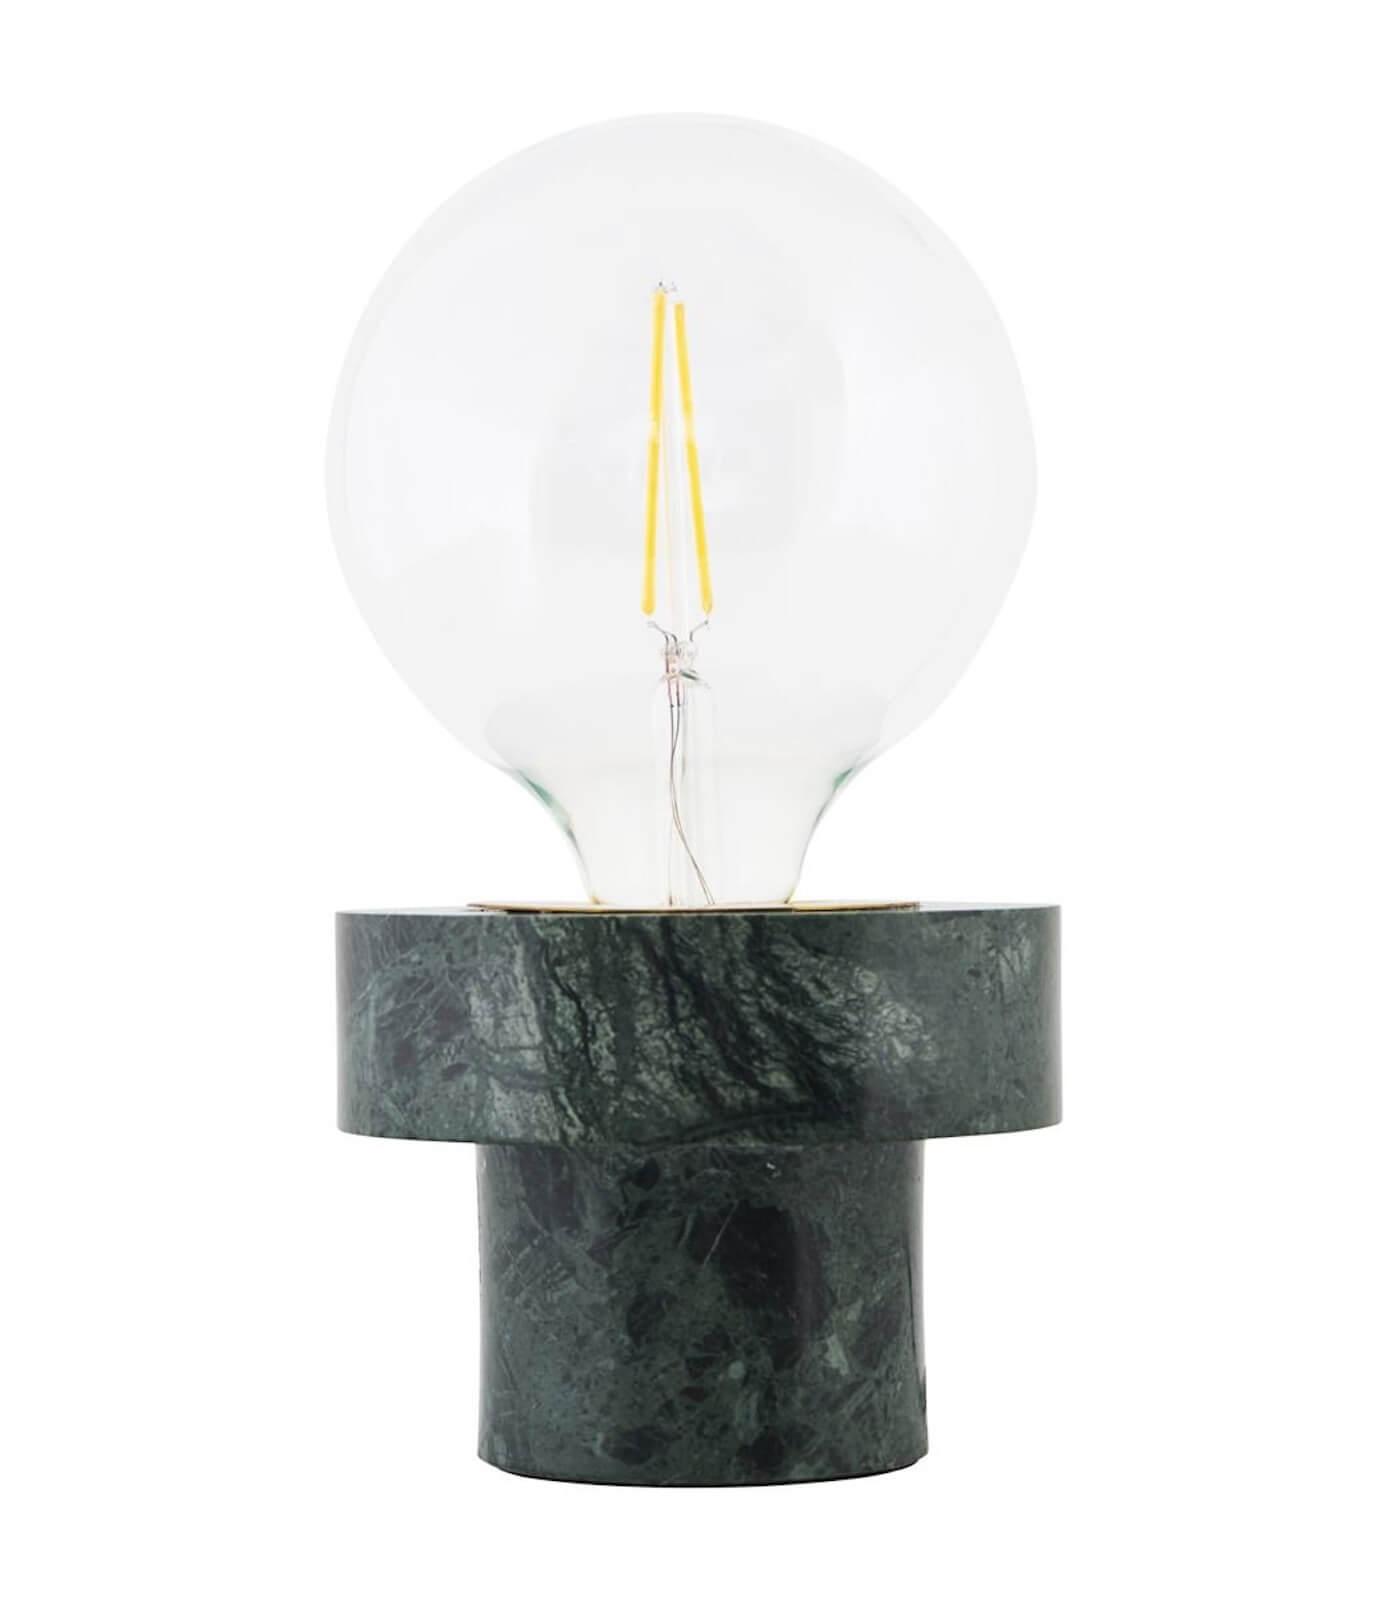 Marbre Pin Vertlaiton De Lampe Table 5RLc34AjqS